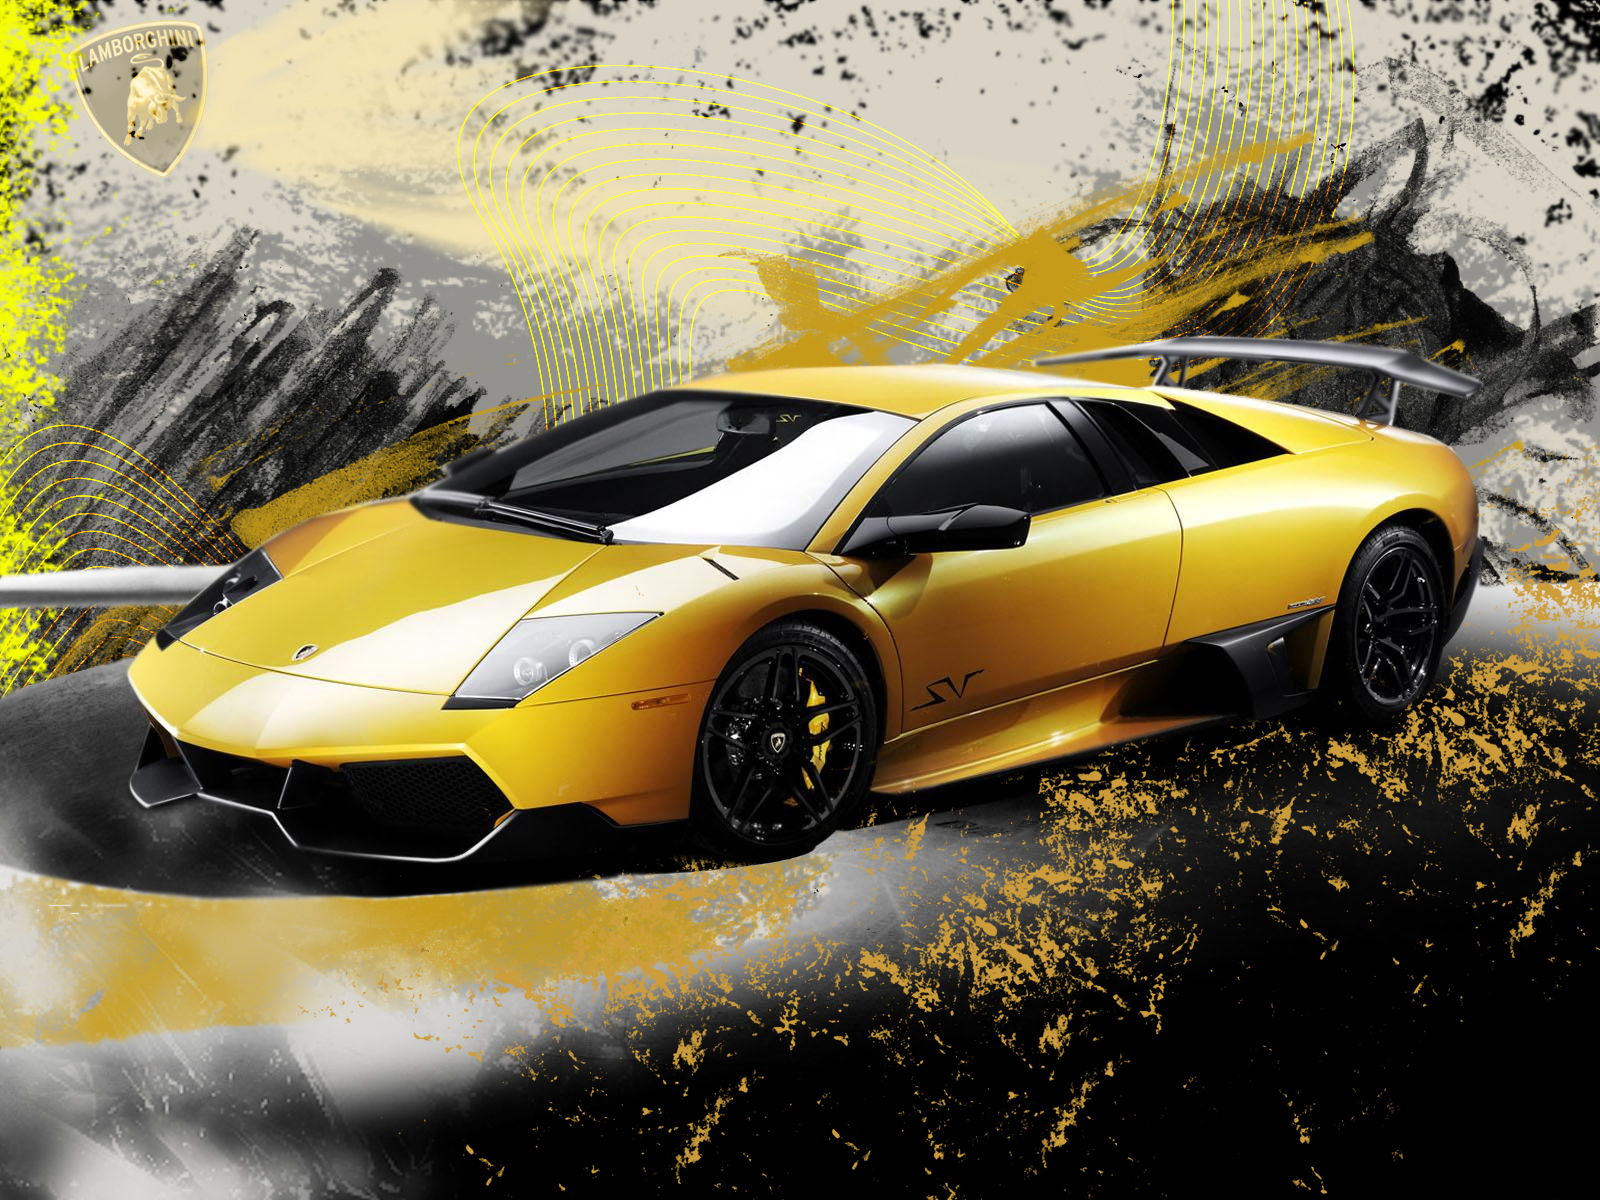 Download The Yellow Cool Car Wallpaper Auto Desktop Background Car